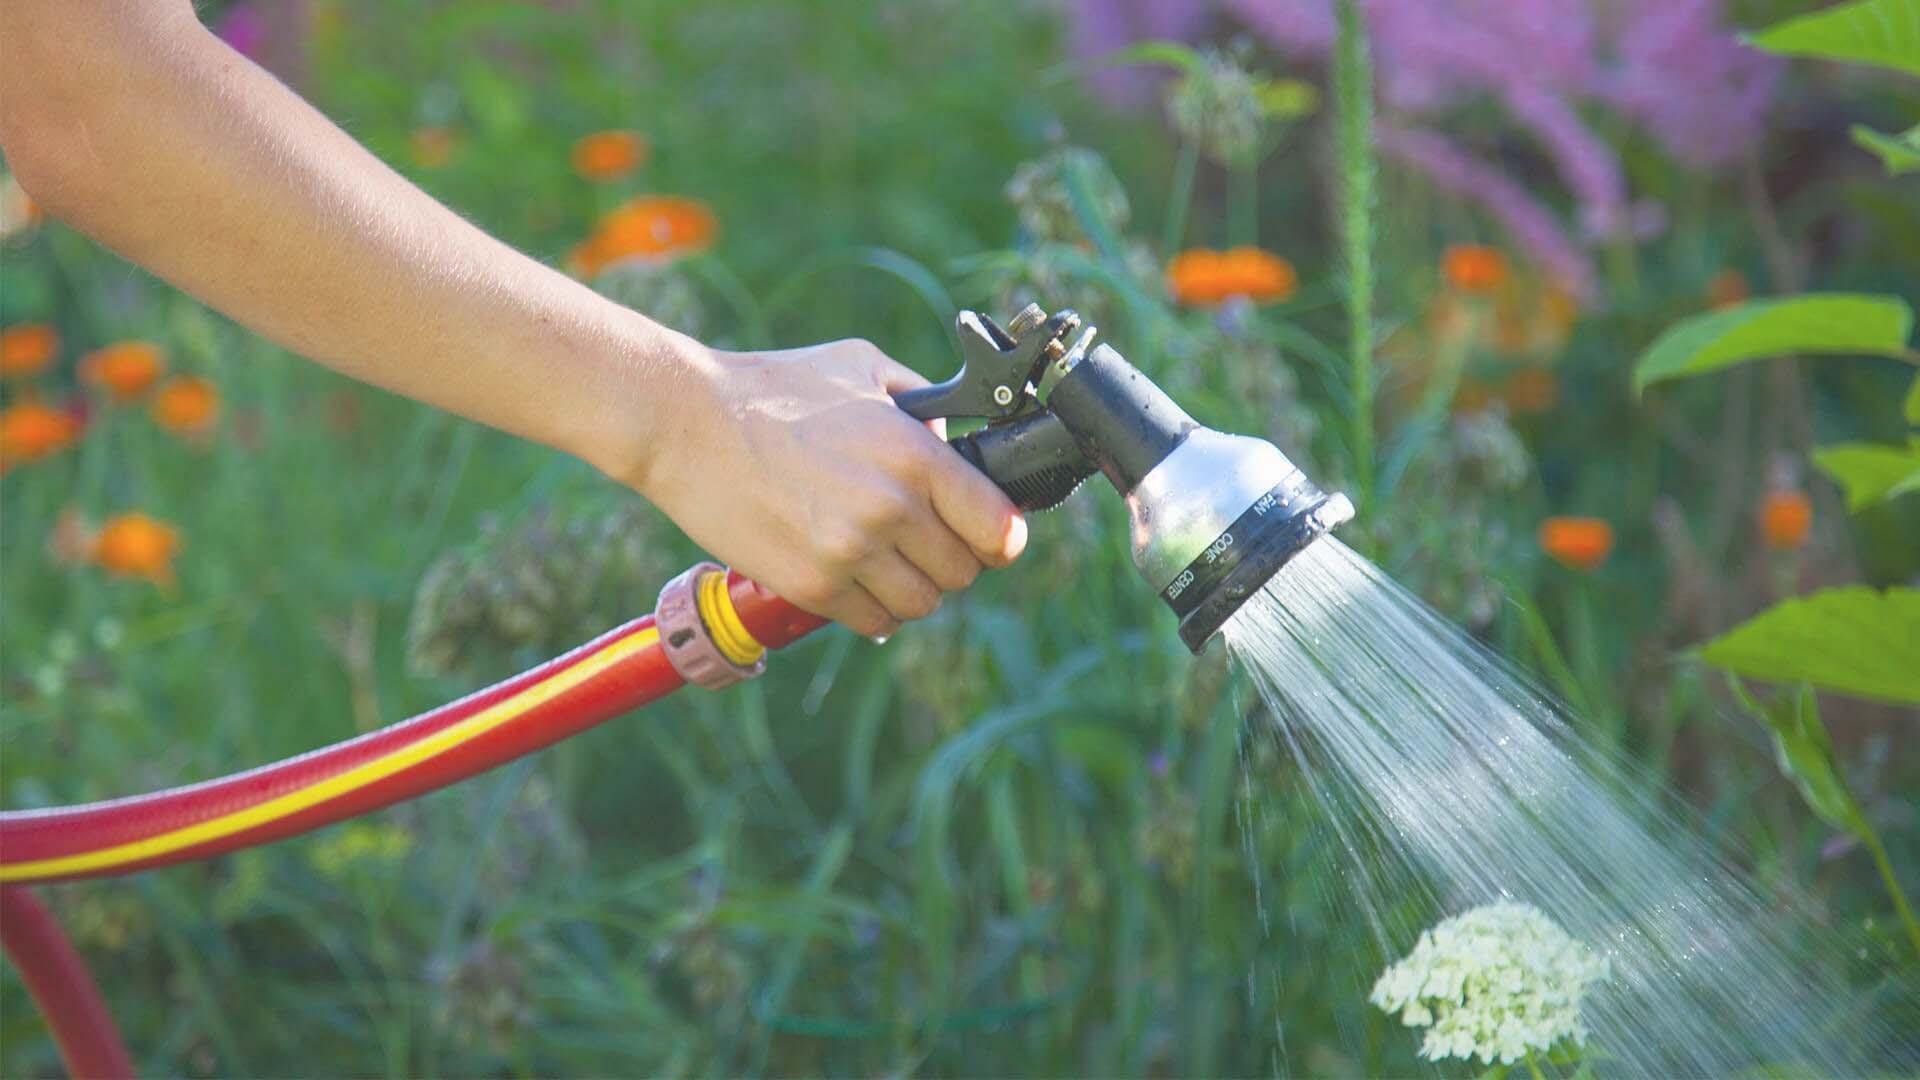 Entretien du jardin dans le jura bernois et bienne for Entretien jardin 27